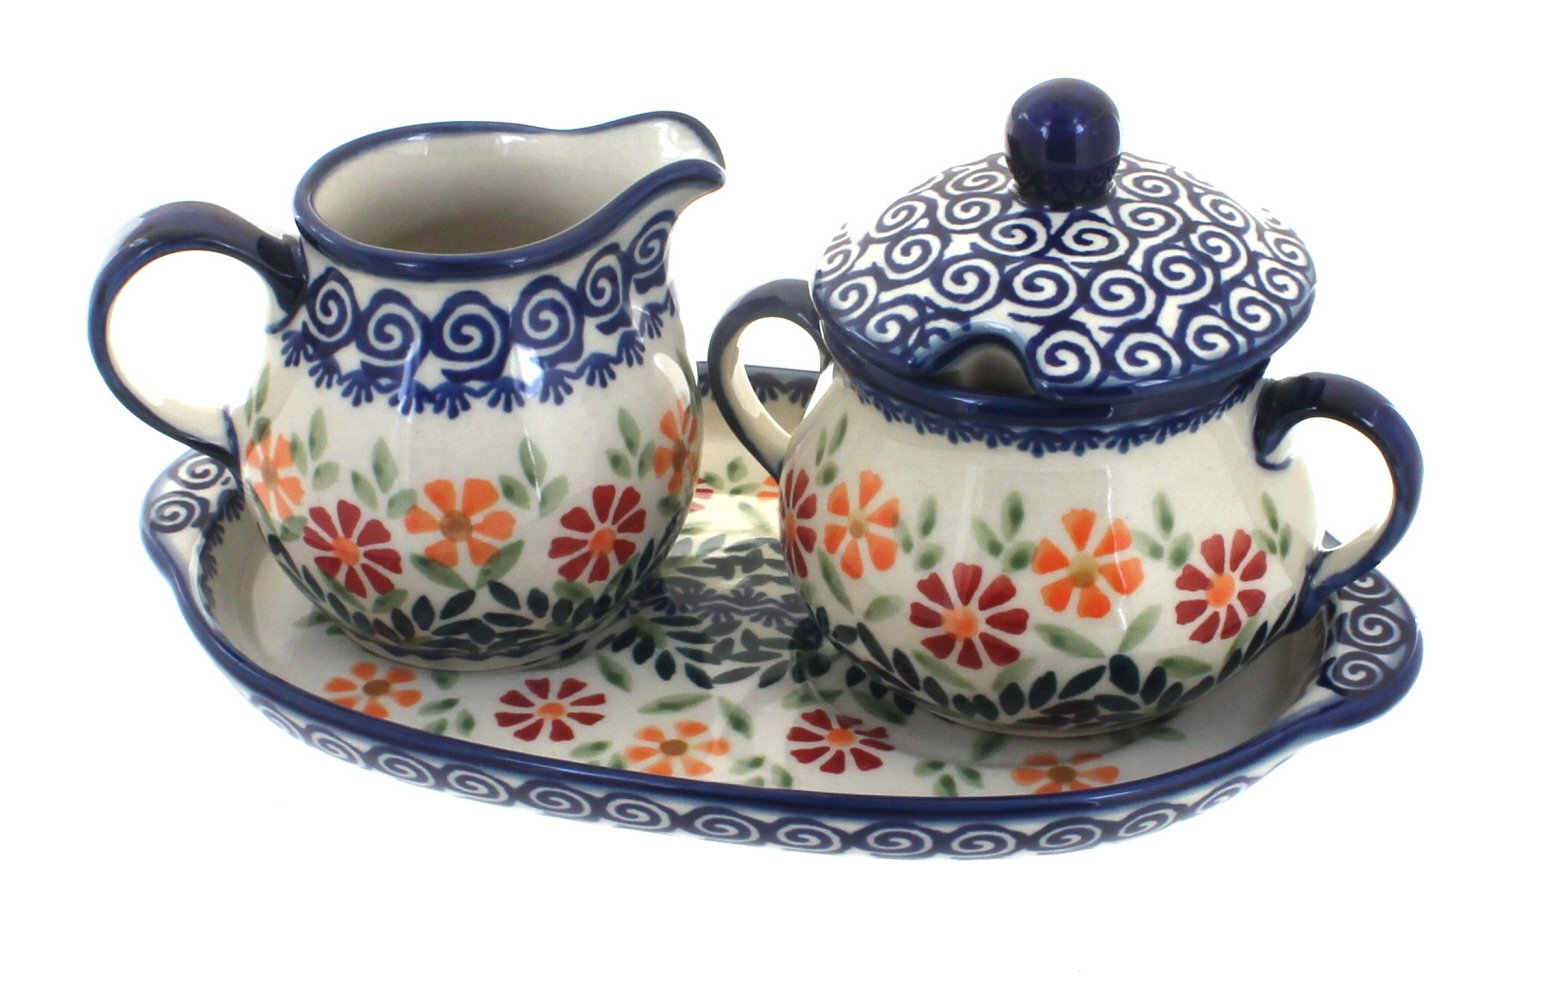 Blue Rose Polish Pottery Garden Bouquet Sugar & Creamer with Tray